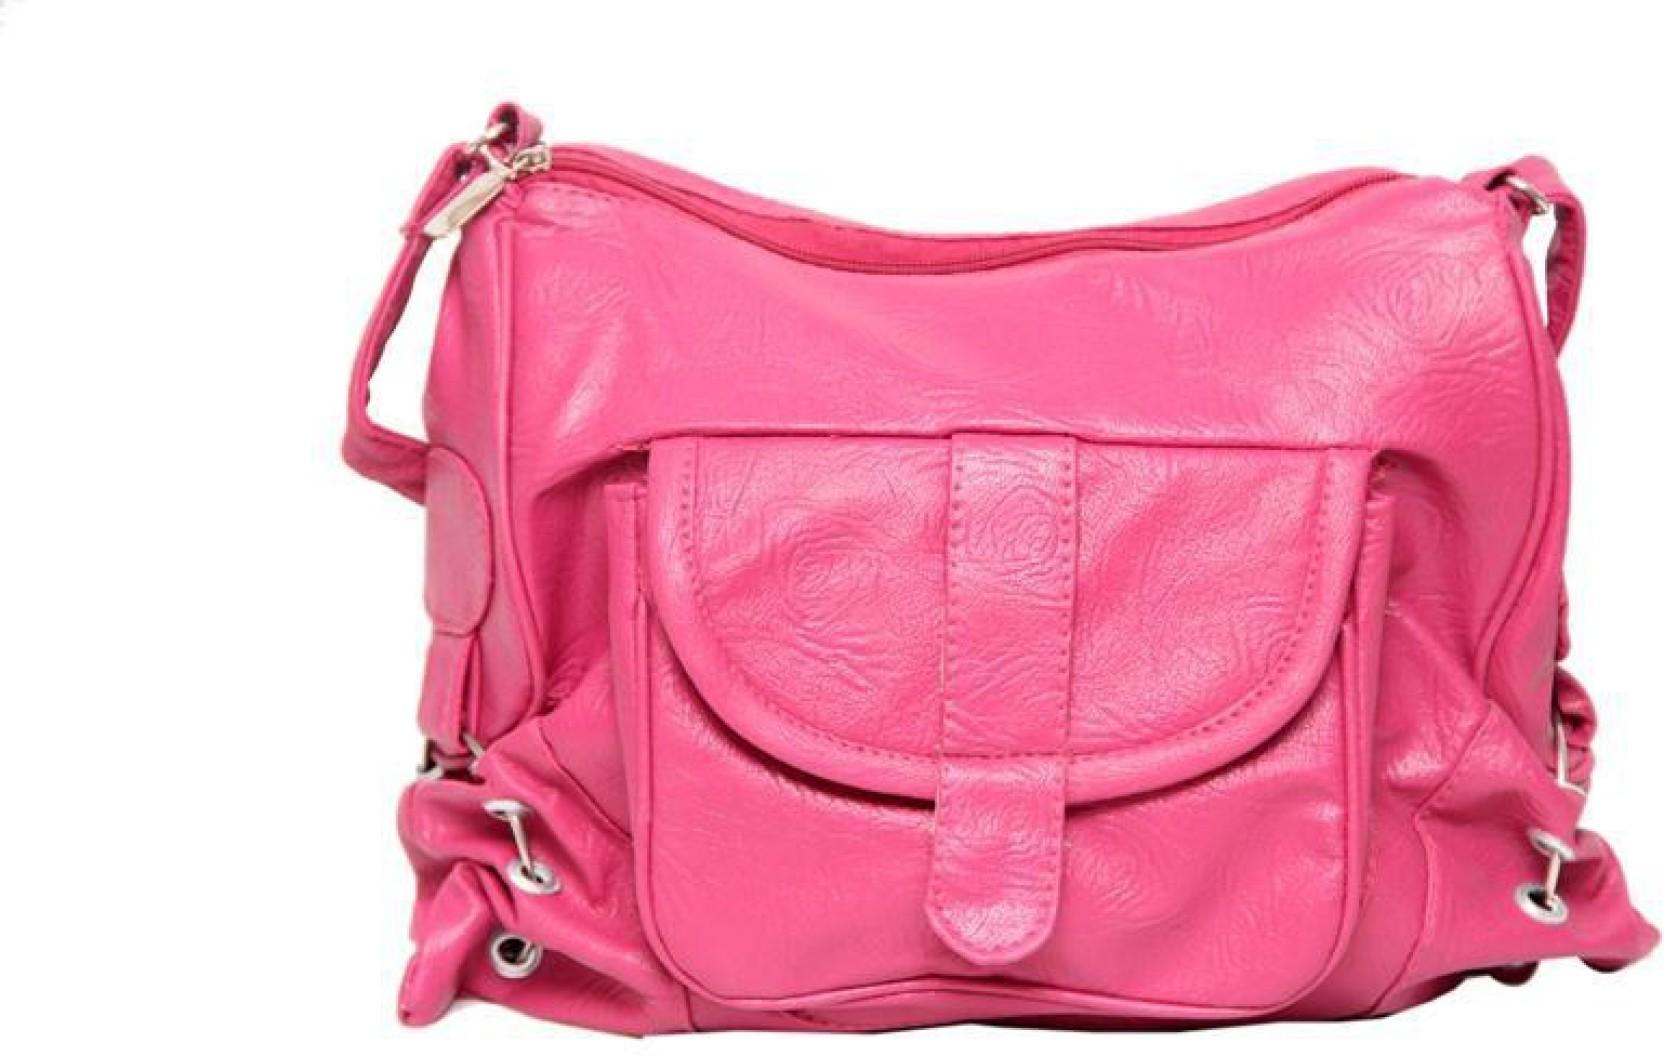 Borse Casual : Borse women casual pink pu sling bag price in india